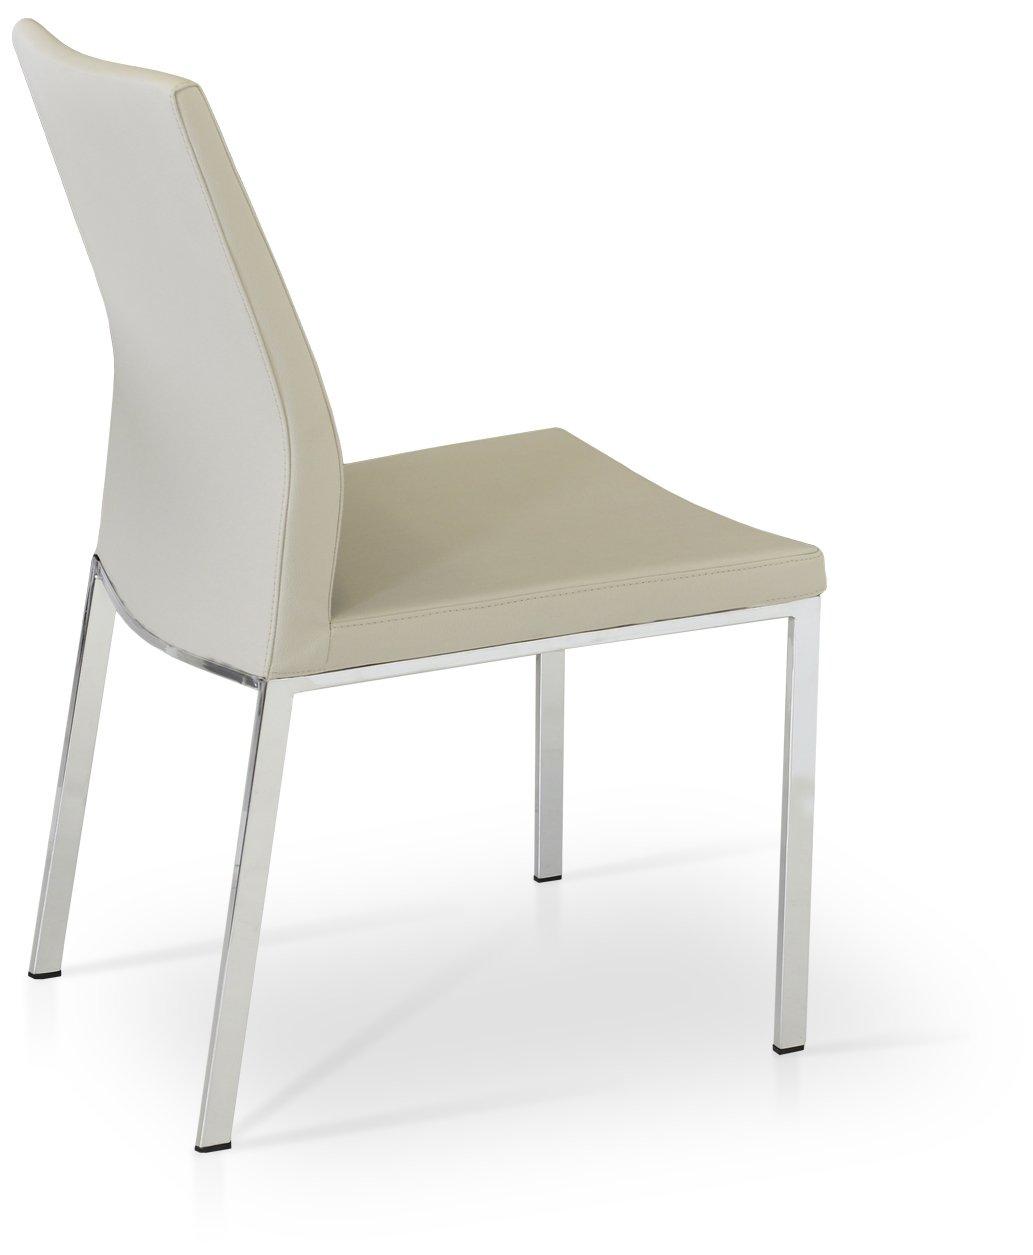 Amazon.com: Soho Concept PashaC-Ch-Blk Pasha Low Back Chair ...